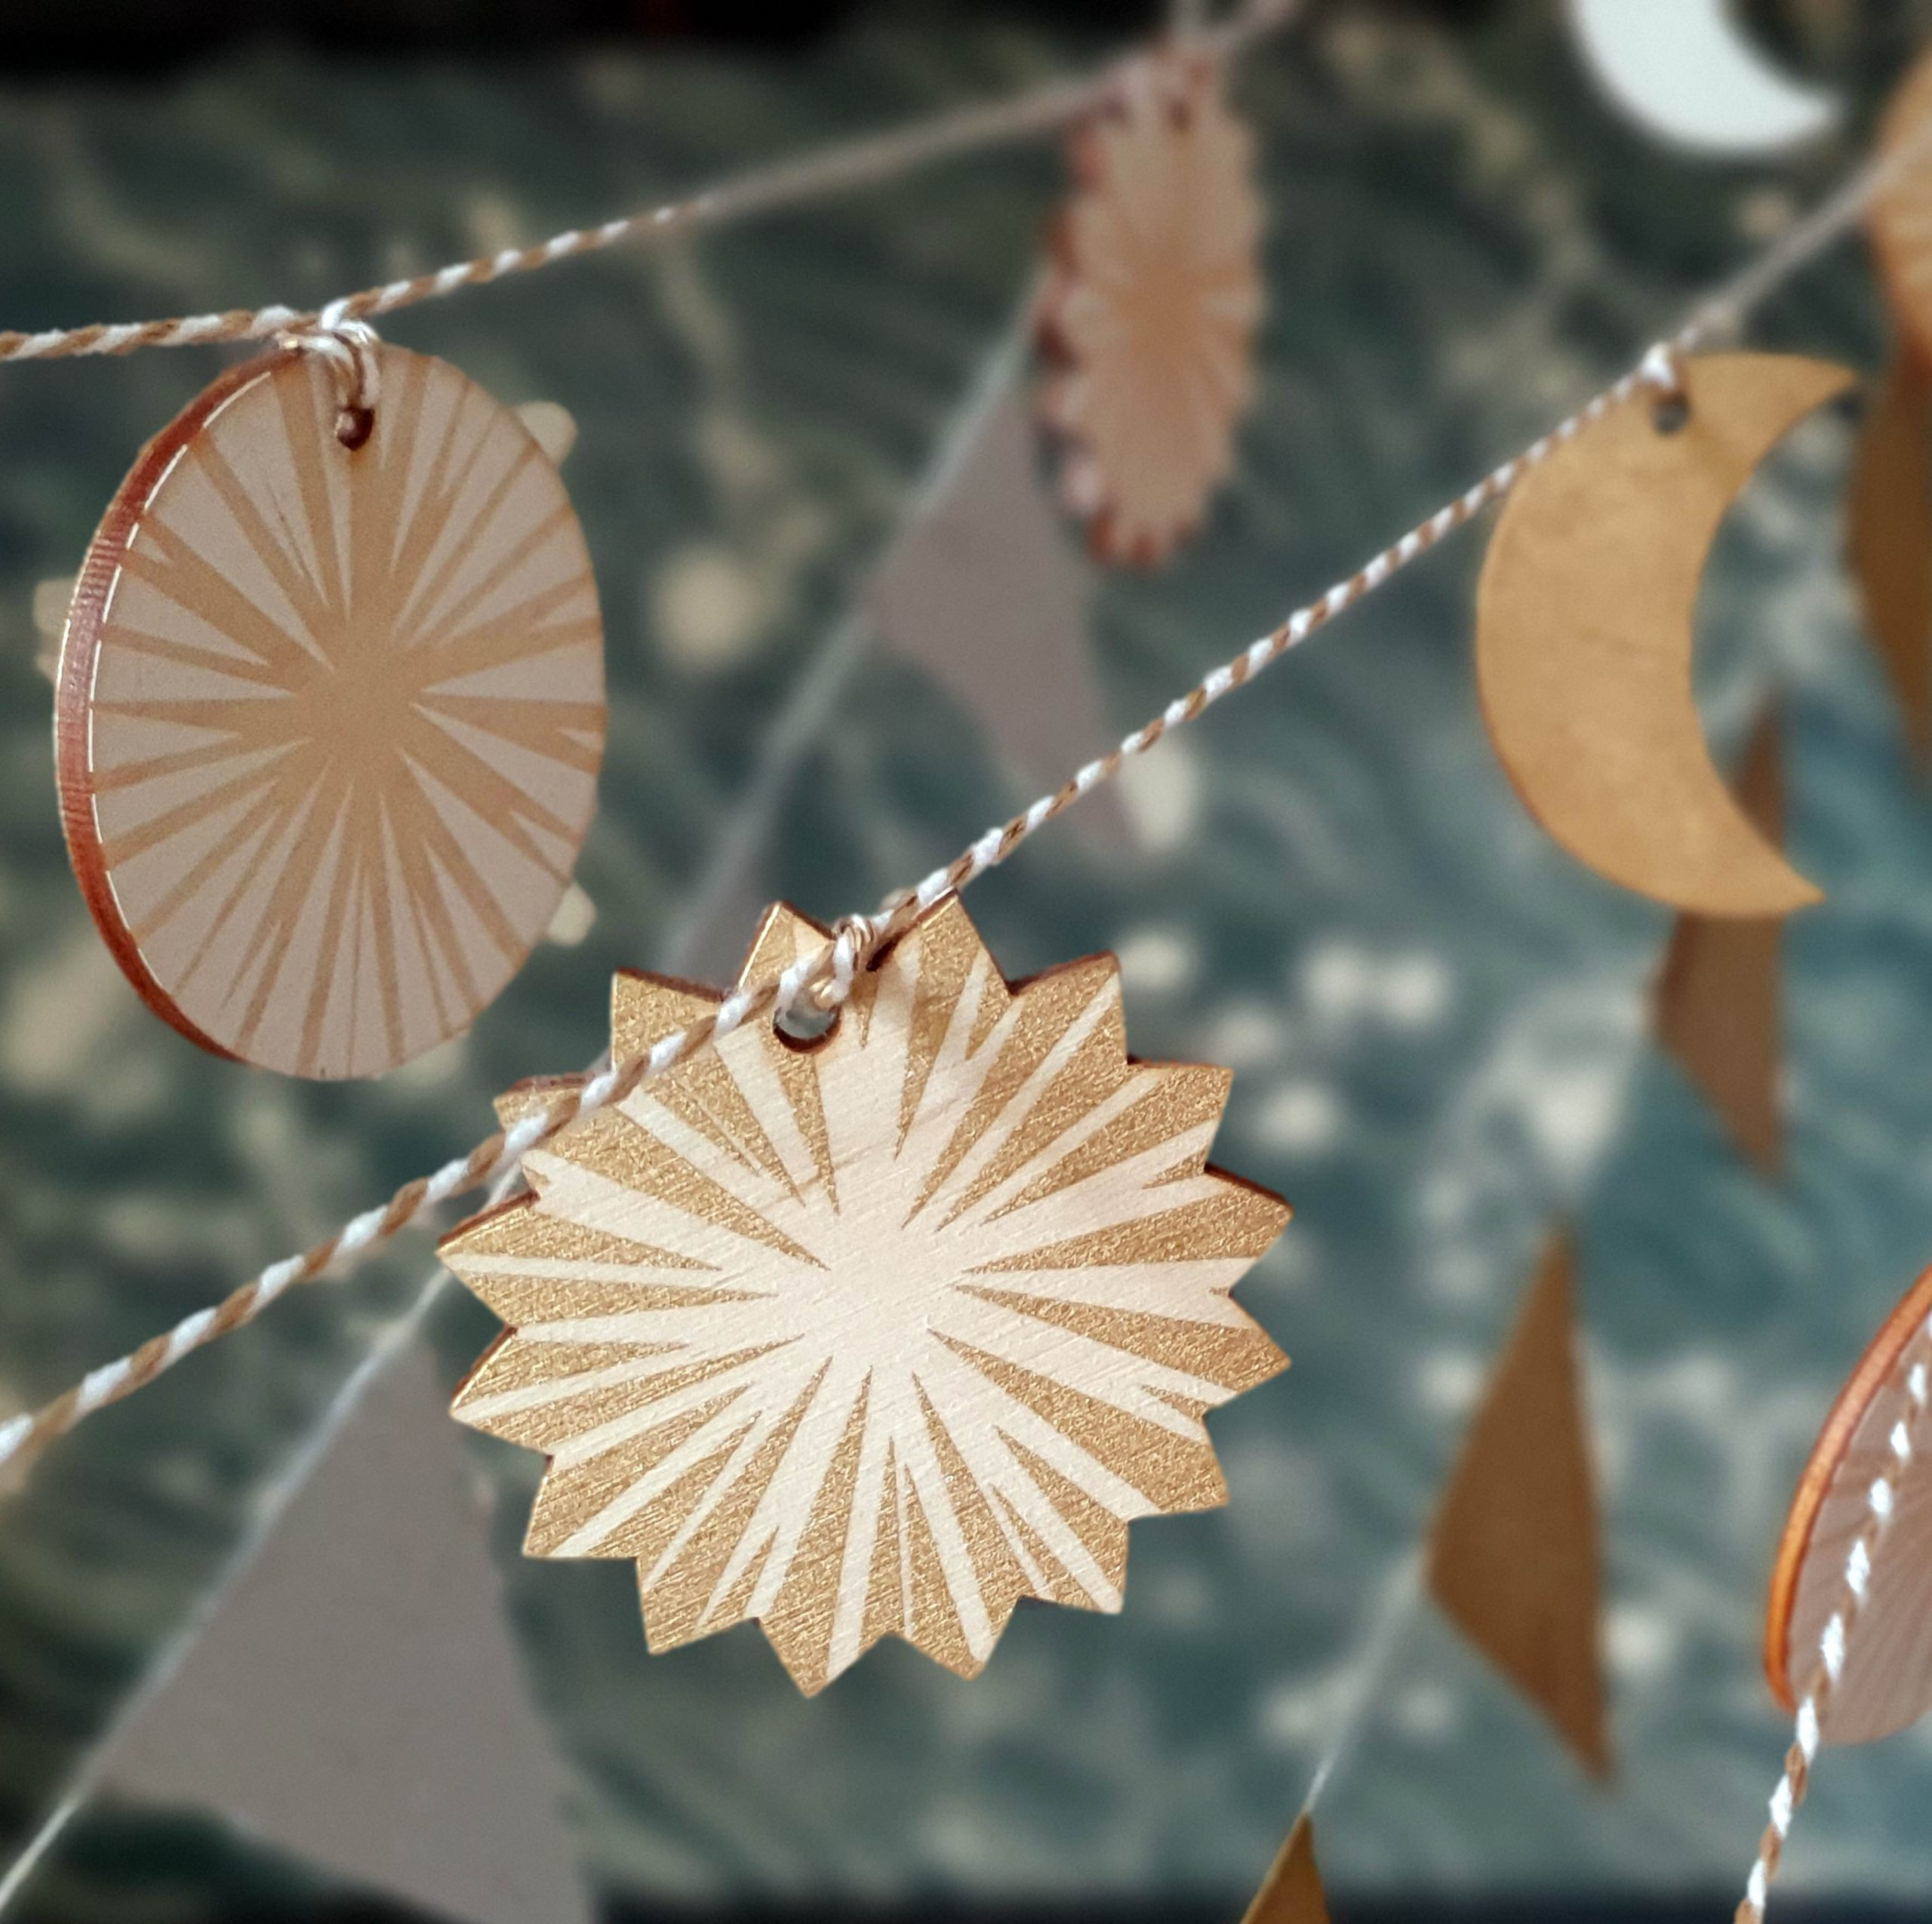 Solstice garland strung